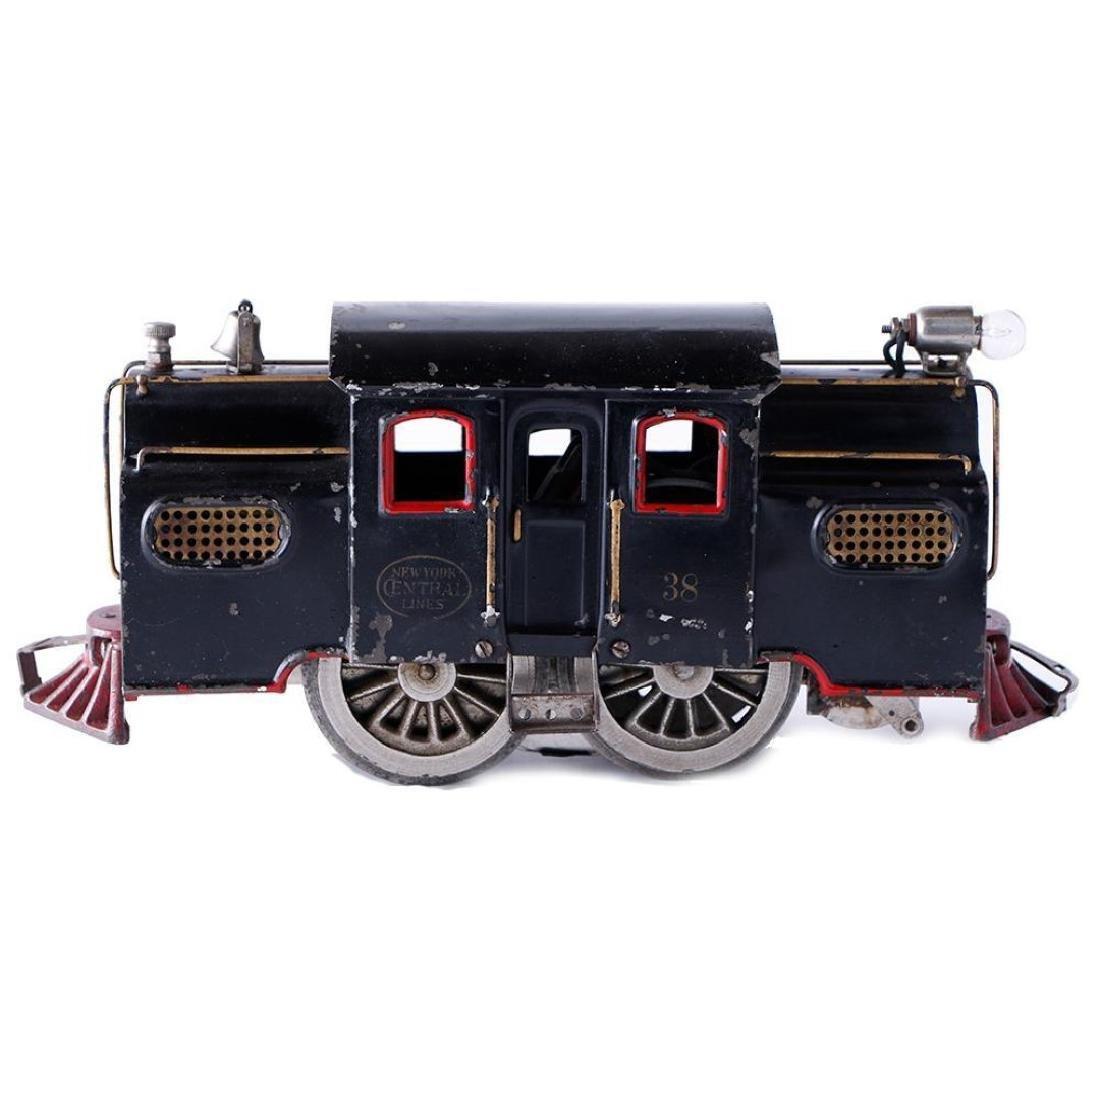 Lionel Standard Gauge Early 38 Locomotive